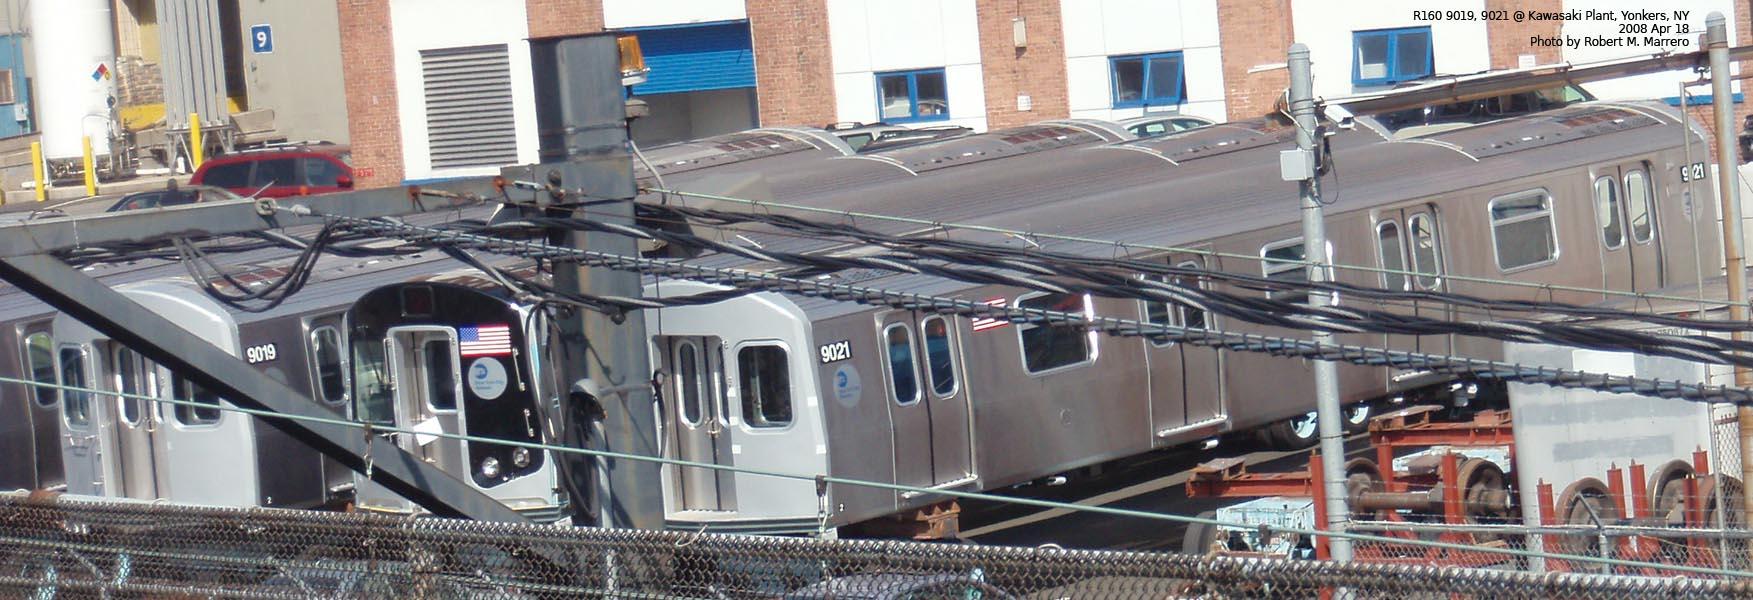 (208k, 1753x600)<br><b>Country:</b> United States<br><b>City:</b> New York<br><b>System:</b> New York City Transit<br><b>Location:</b> Kawasaki Plant, Yonkers, NY<br><b>Car:</b> R-160B (Option 1) (Kawasaki, 2008-2009)  9019/?/9021 <br><b>Photo by:</b> Robert Marrero<br><b>Date:</b> 4/18/2008<br><b>Notes:</b> Two B and one A car of the R160B option order at Kawasaki Plant, Yonkers.<br><b>Viewed (this week/total):</b> 0 / 4187